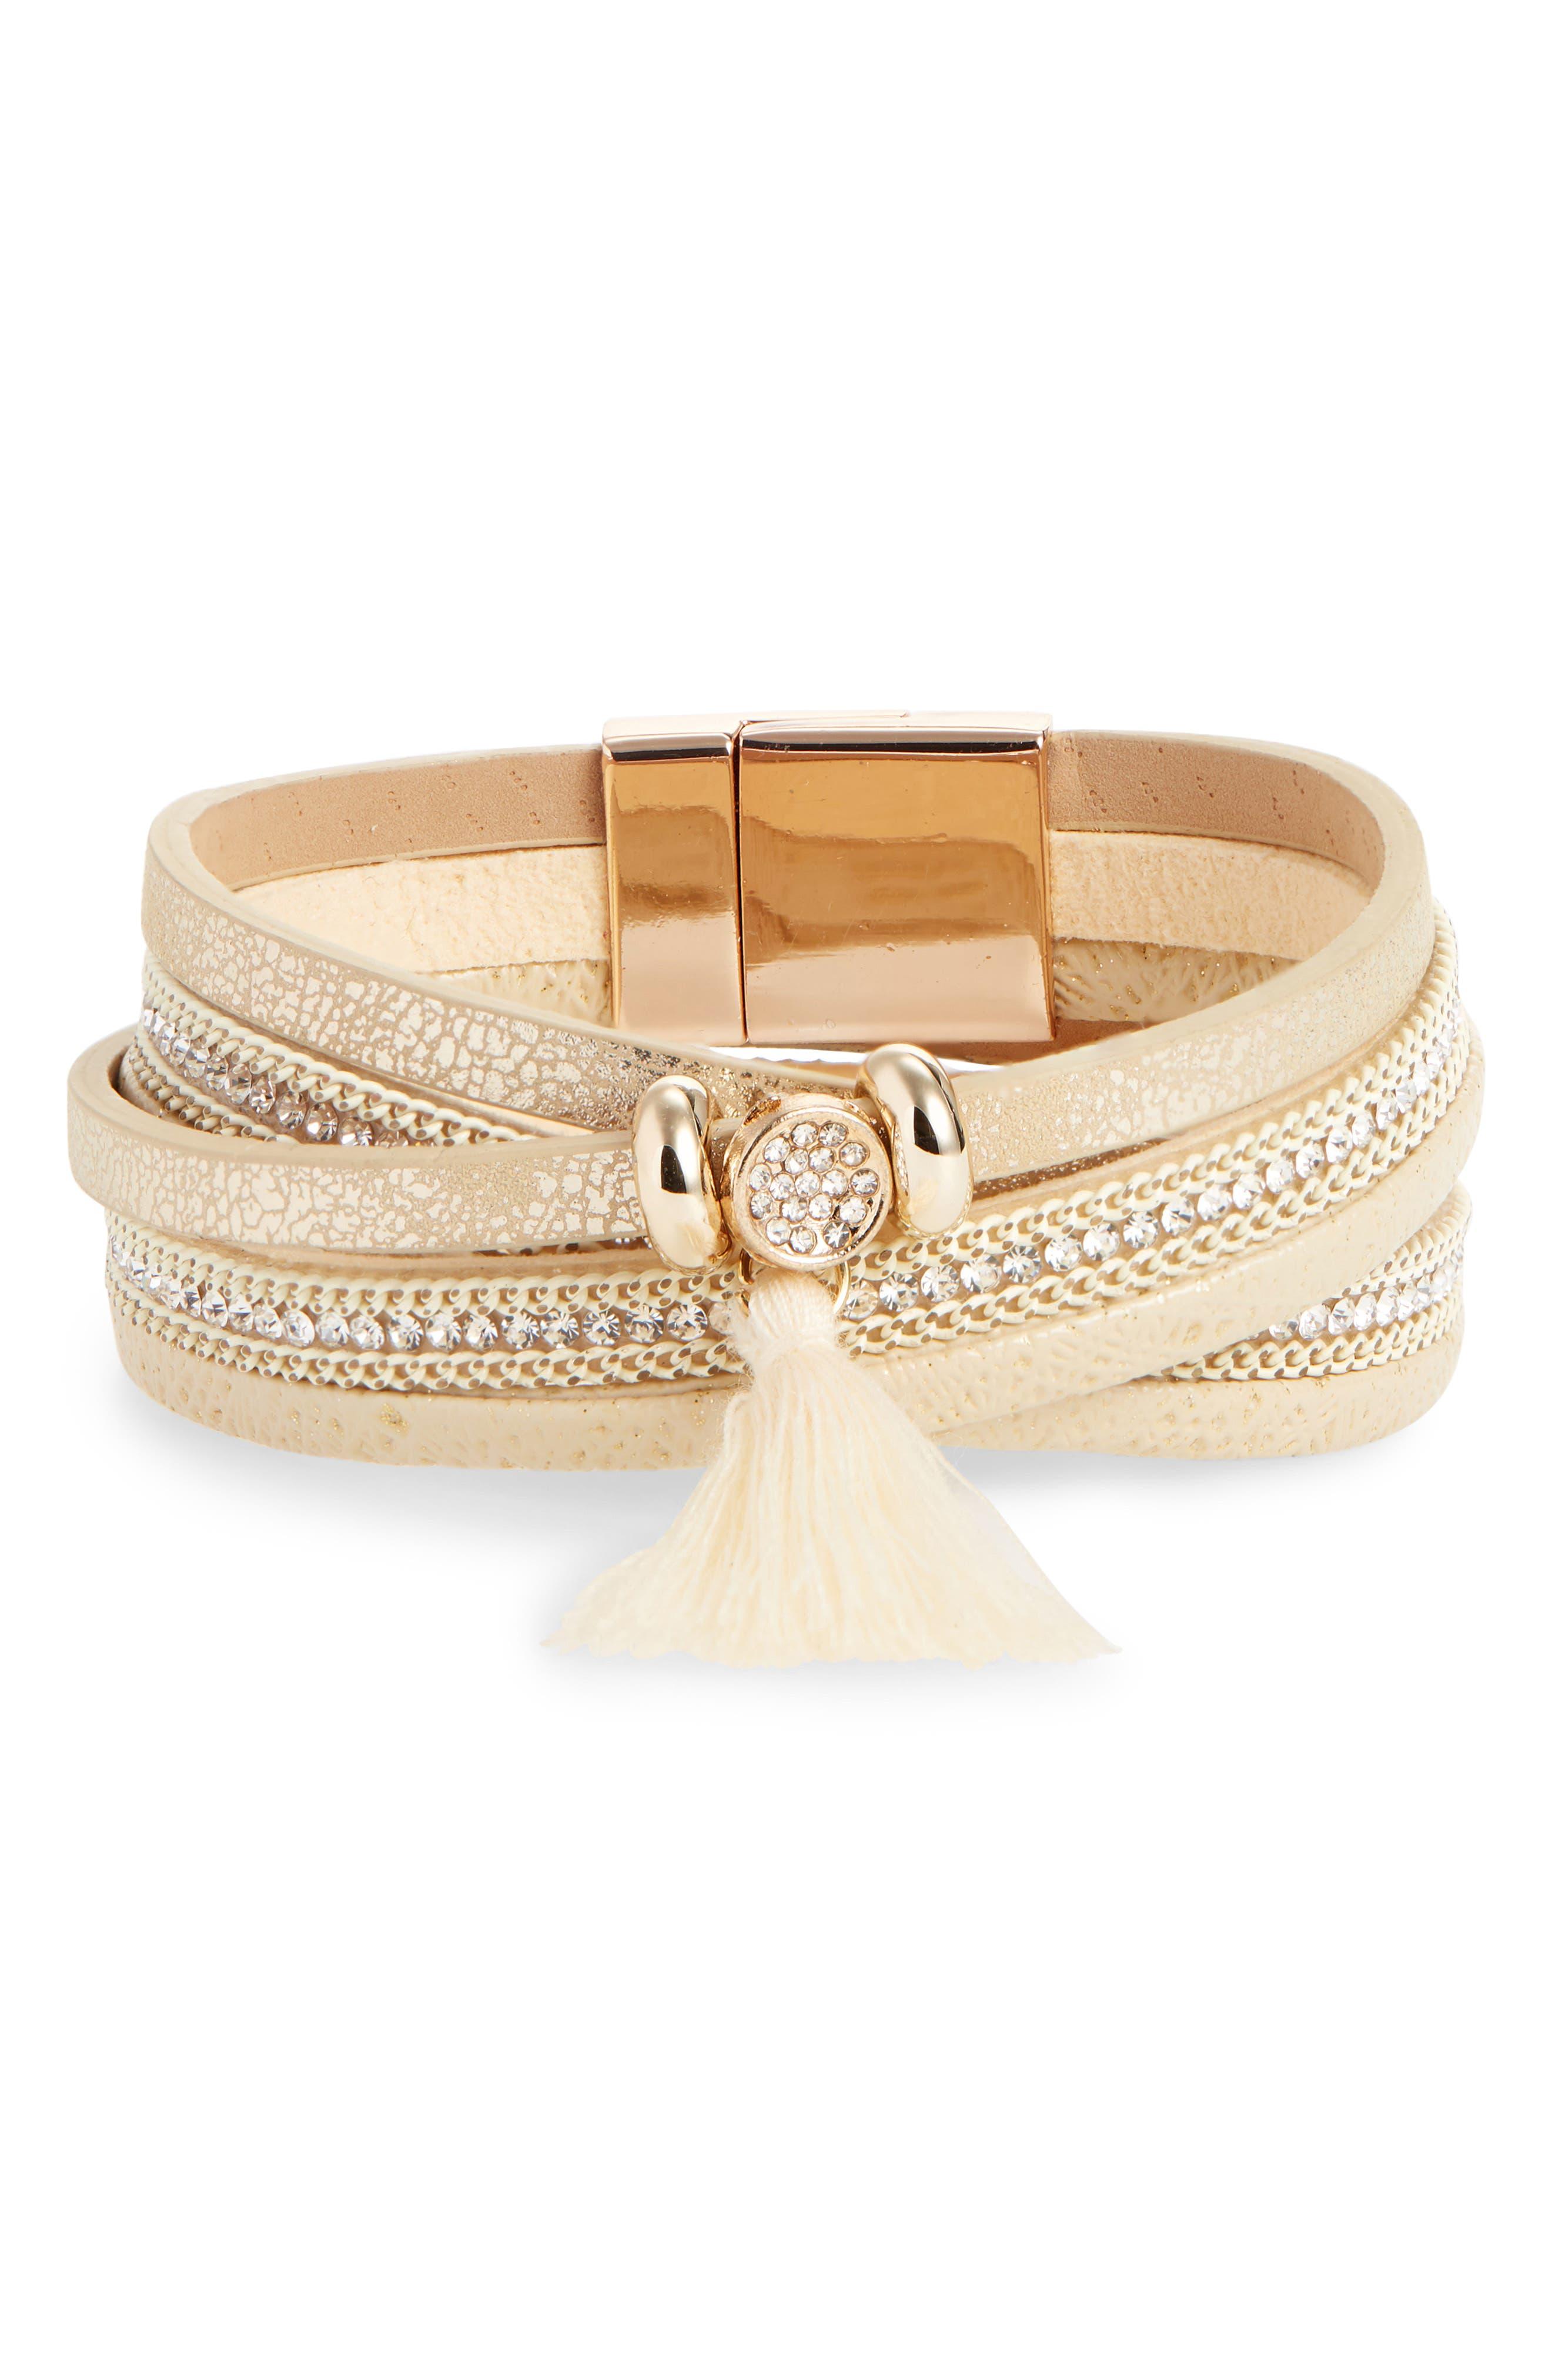 Tassel Leather & Crystal Multi Row Bracelet,                         Main,                         color, GOLD/ IVORY